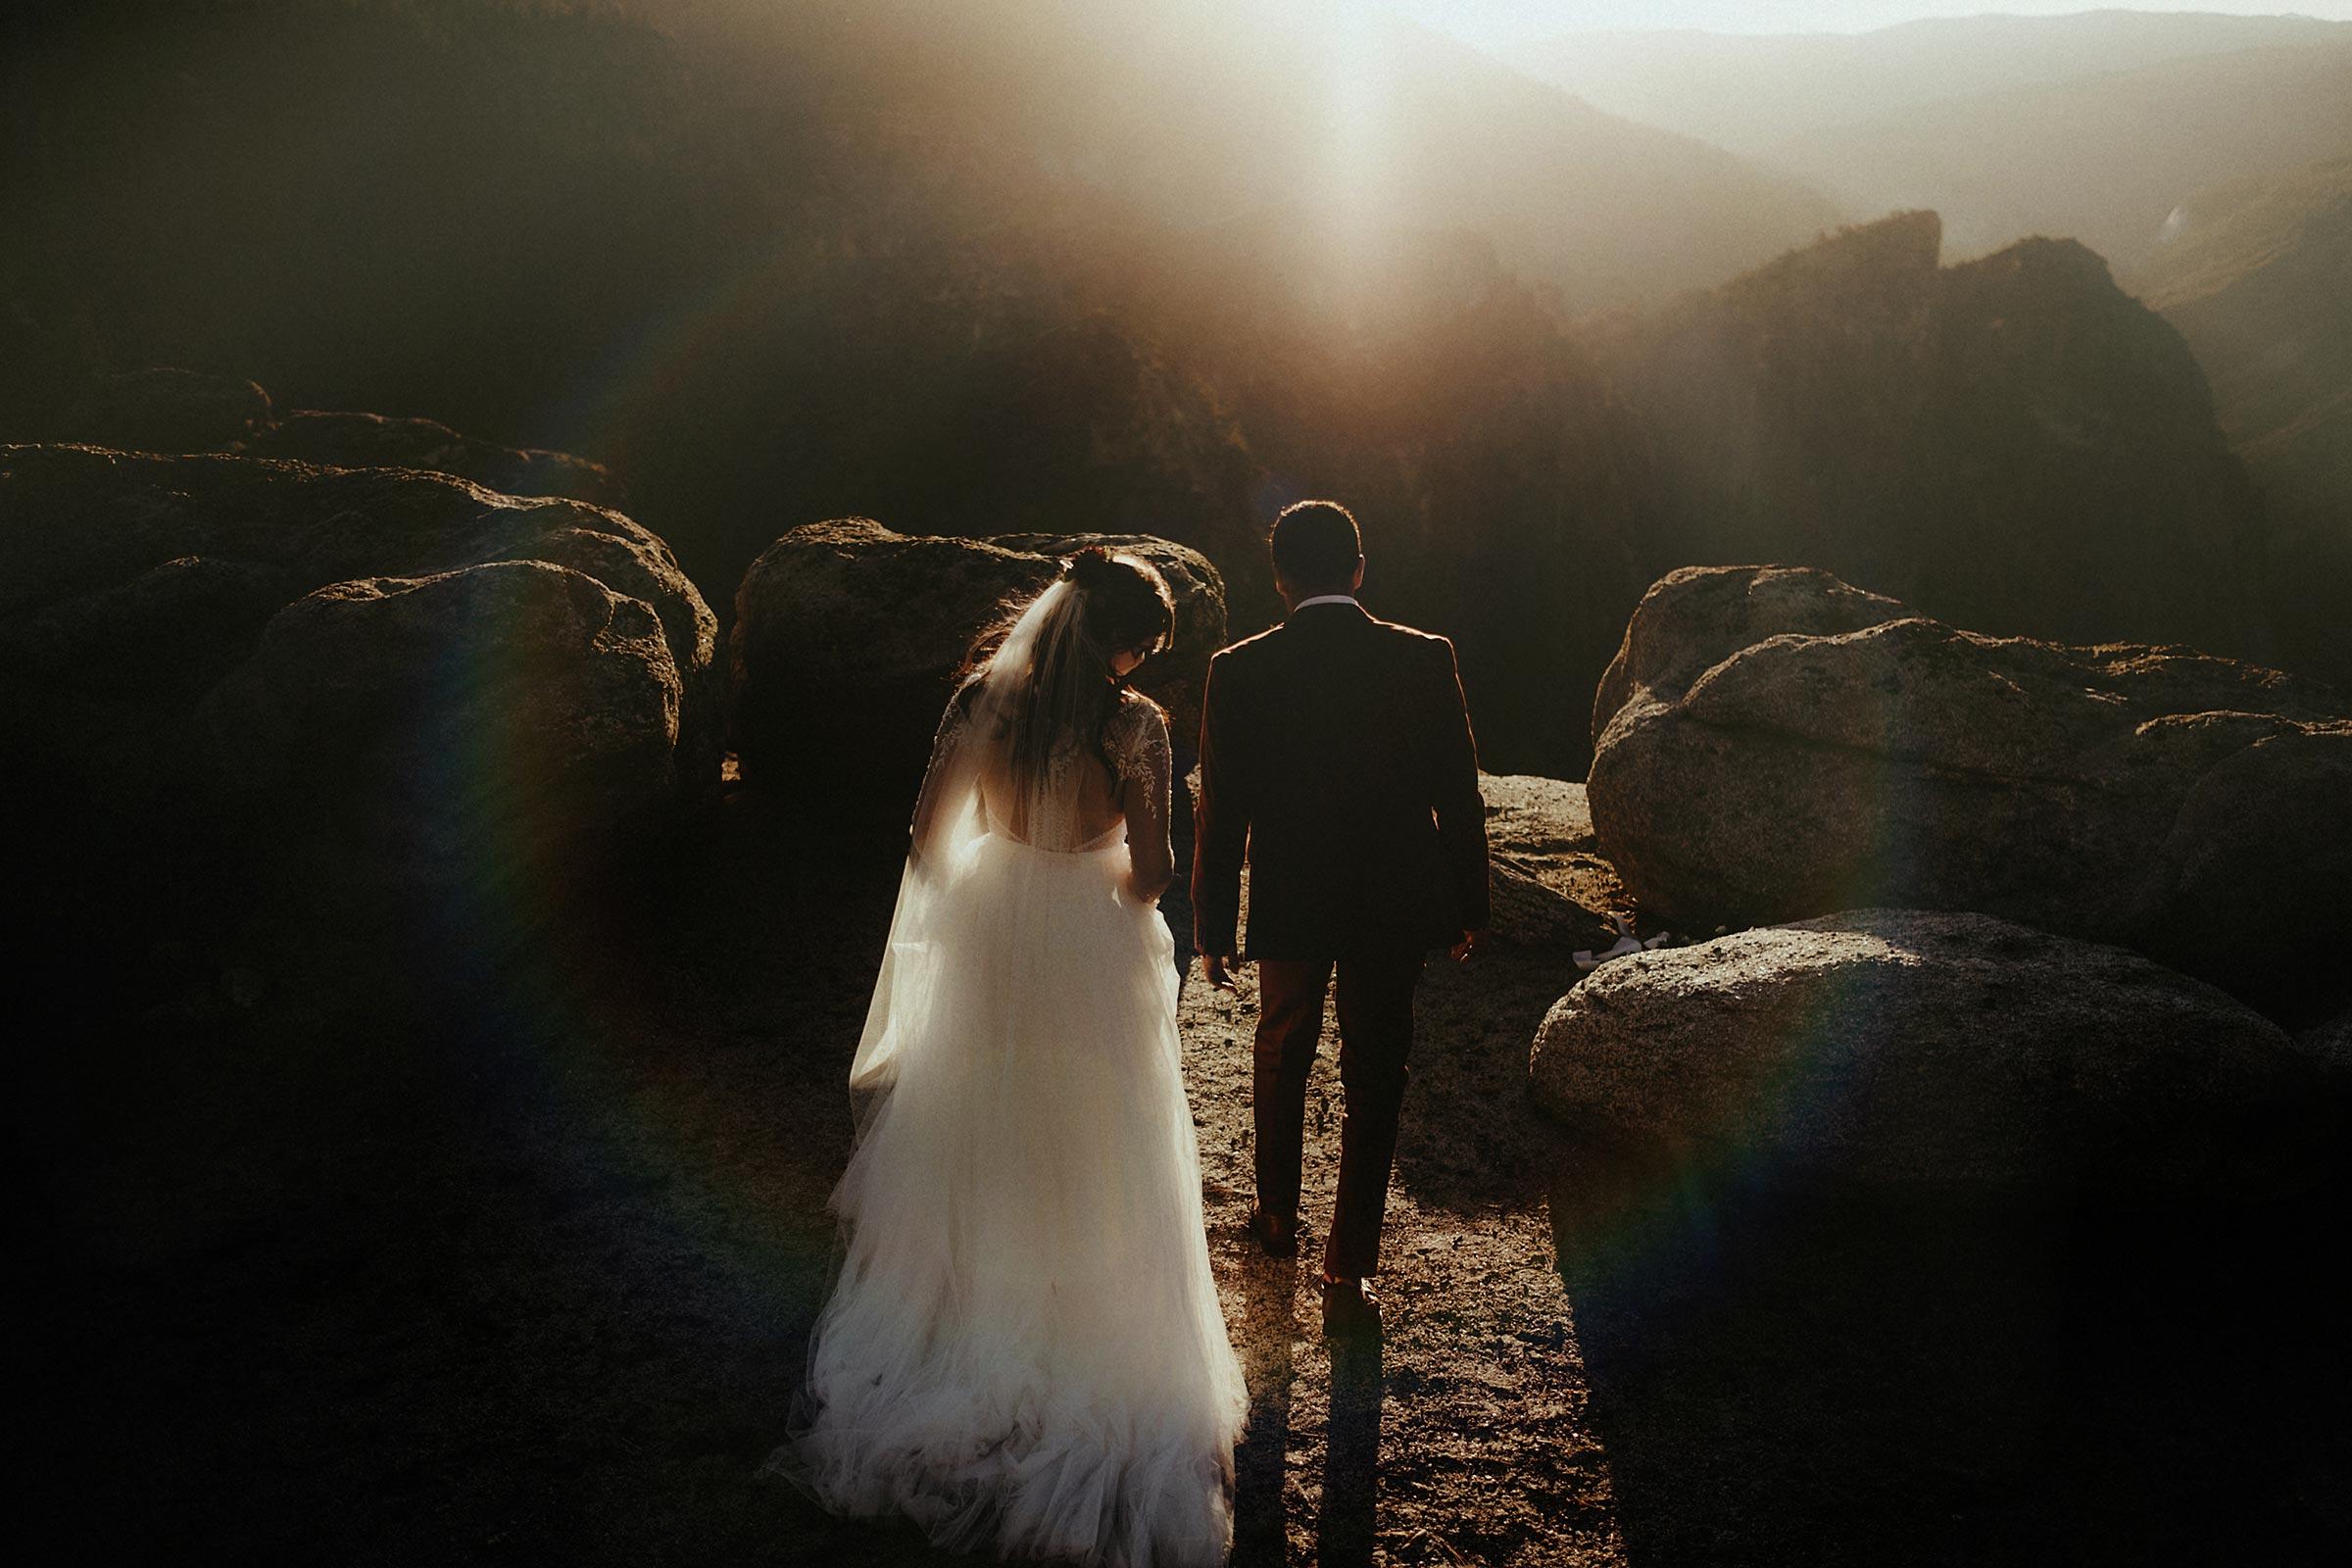 provence france adventure elopement wedding photographer goult windmill sunset